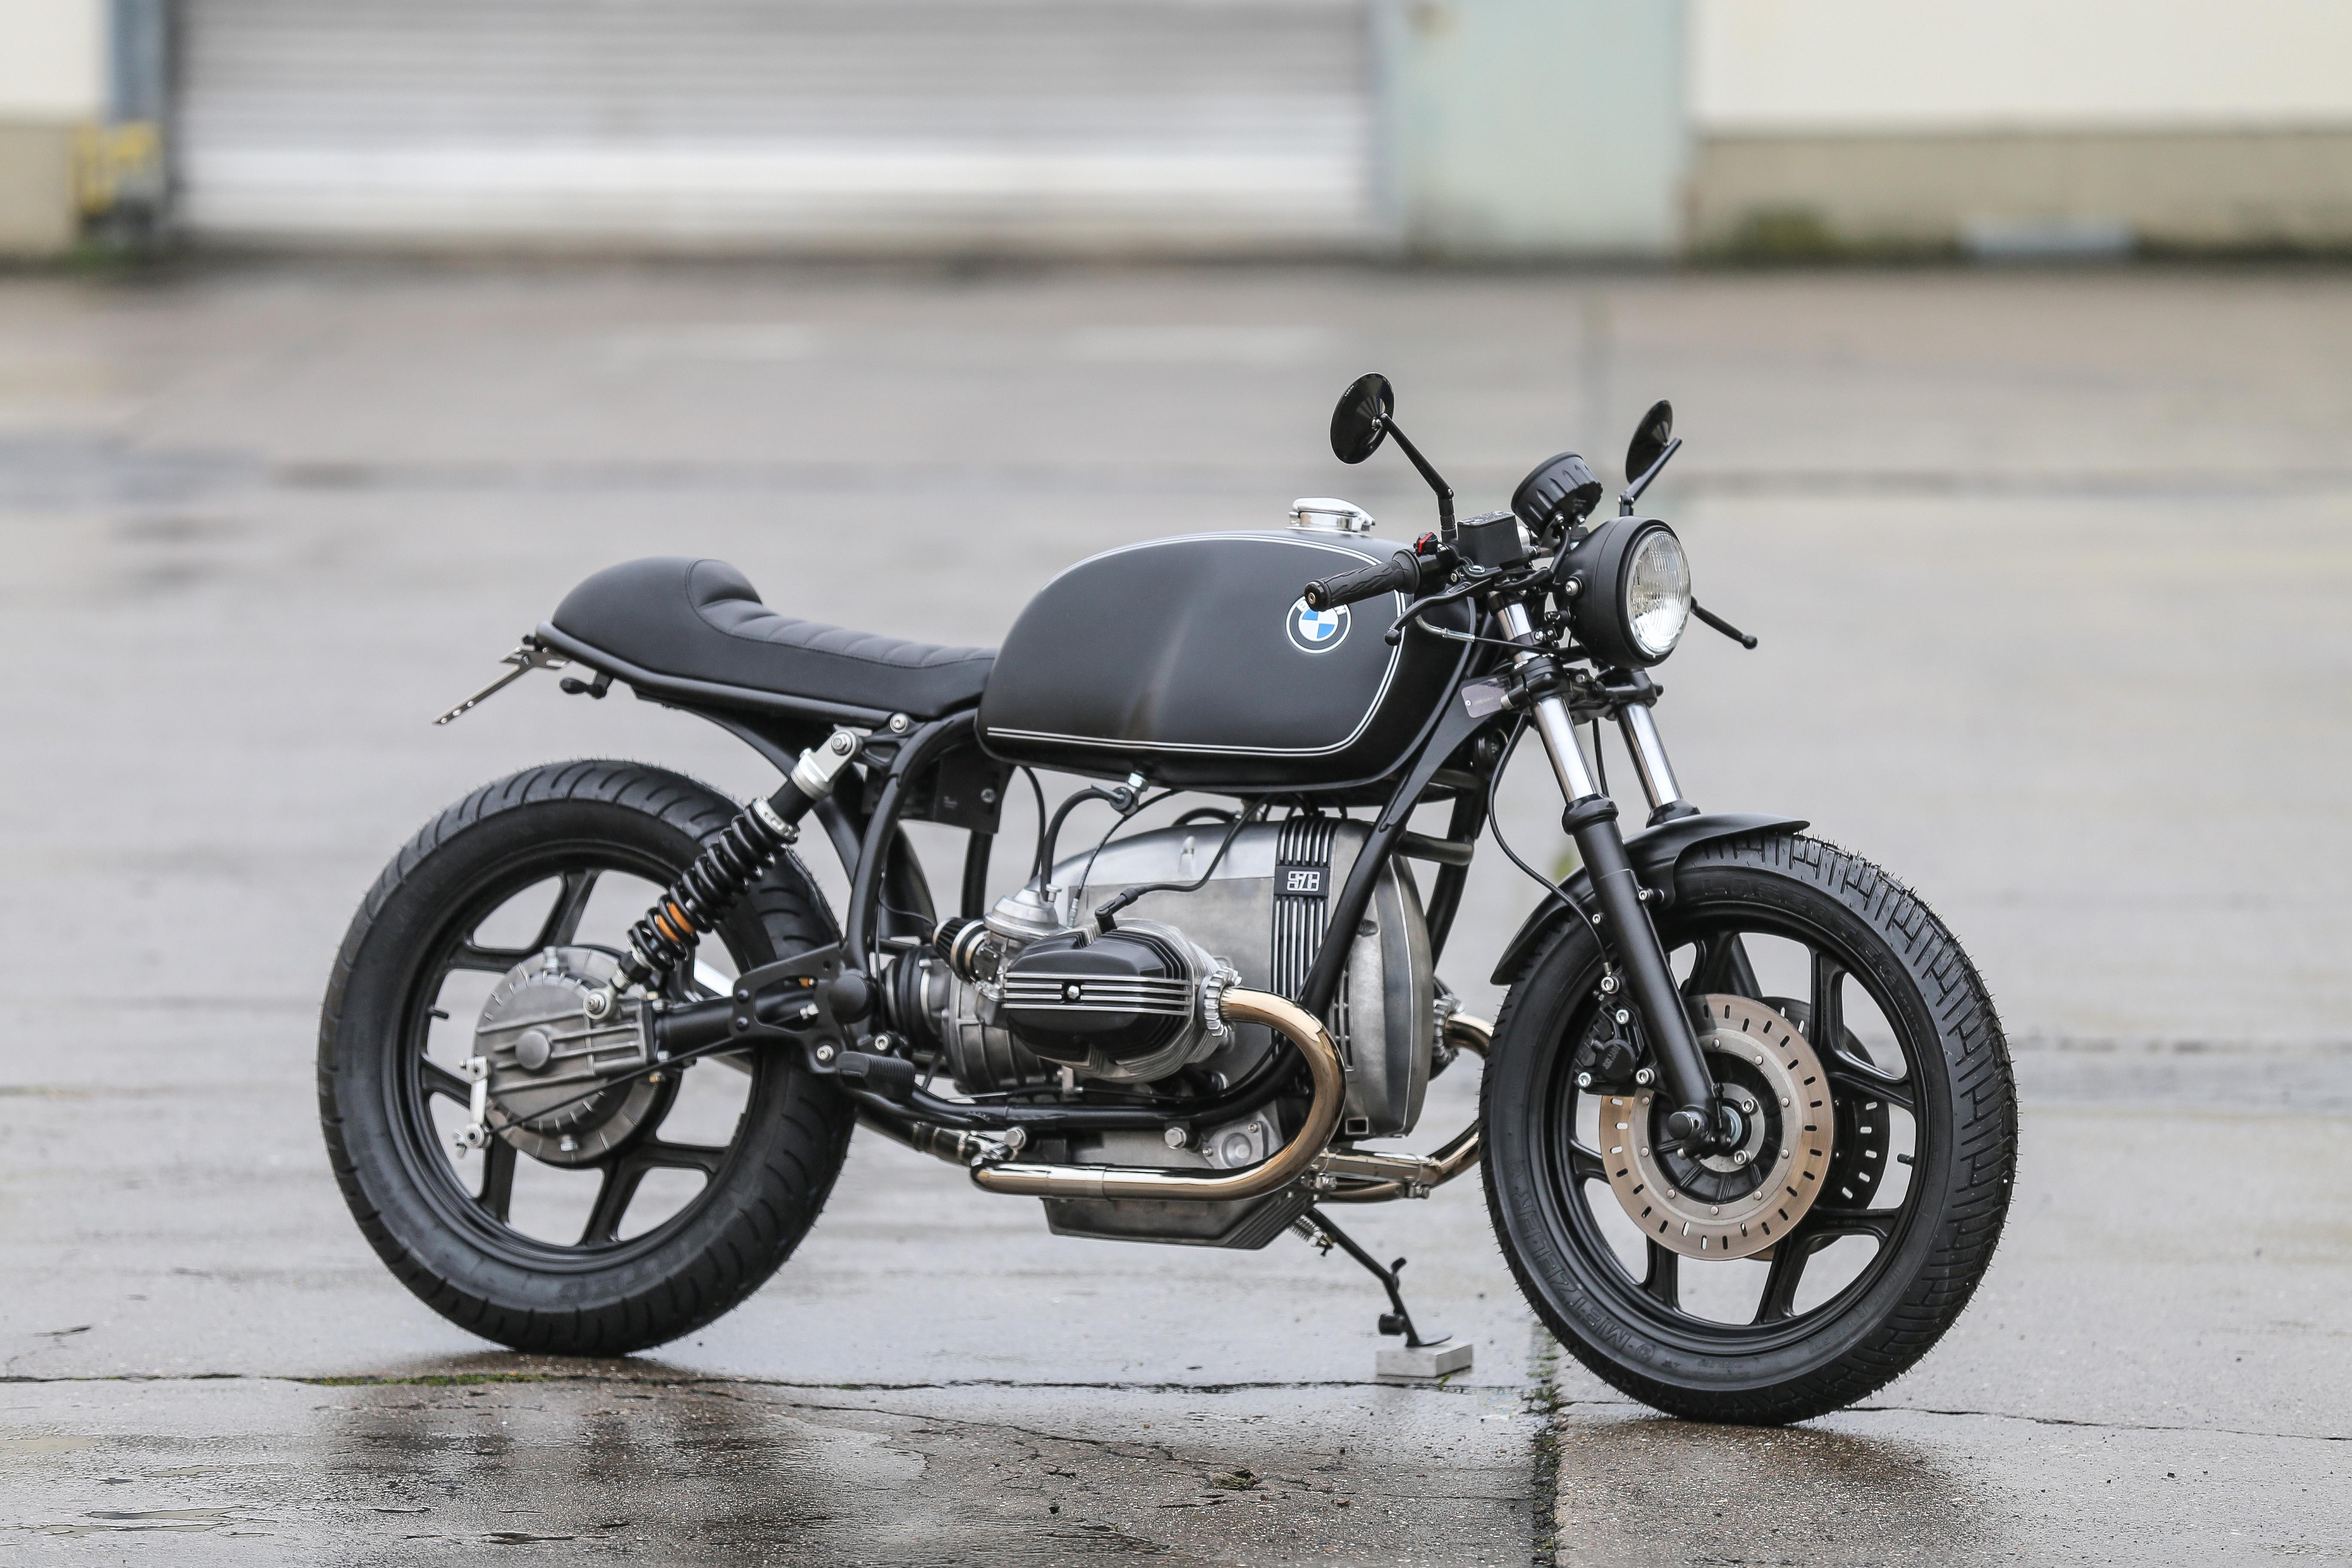 kraftfahrzeuge motorrad motorrad teile ihre suche. Black Bedroom Furniture Sets. Home Design Ideas